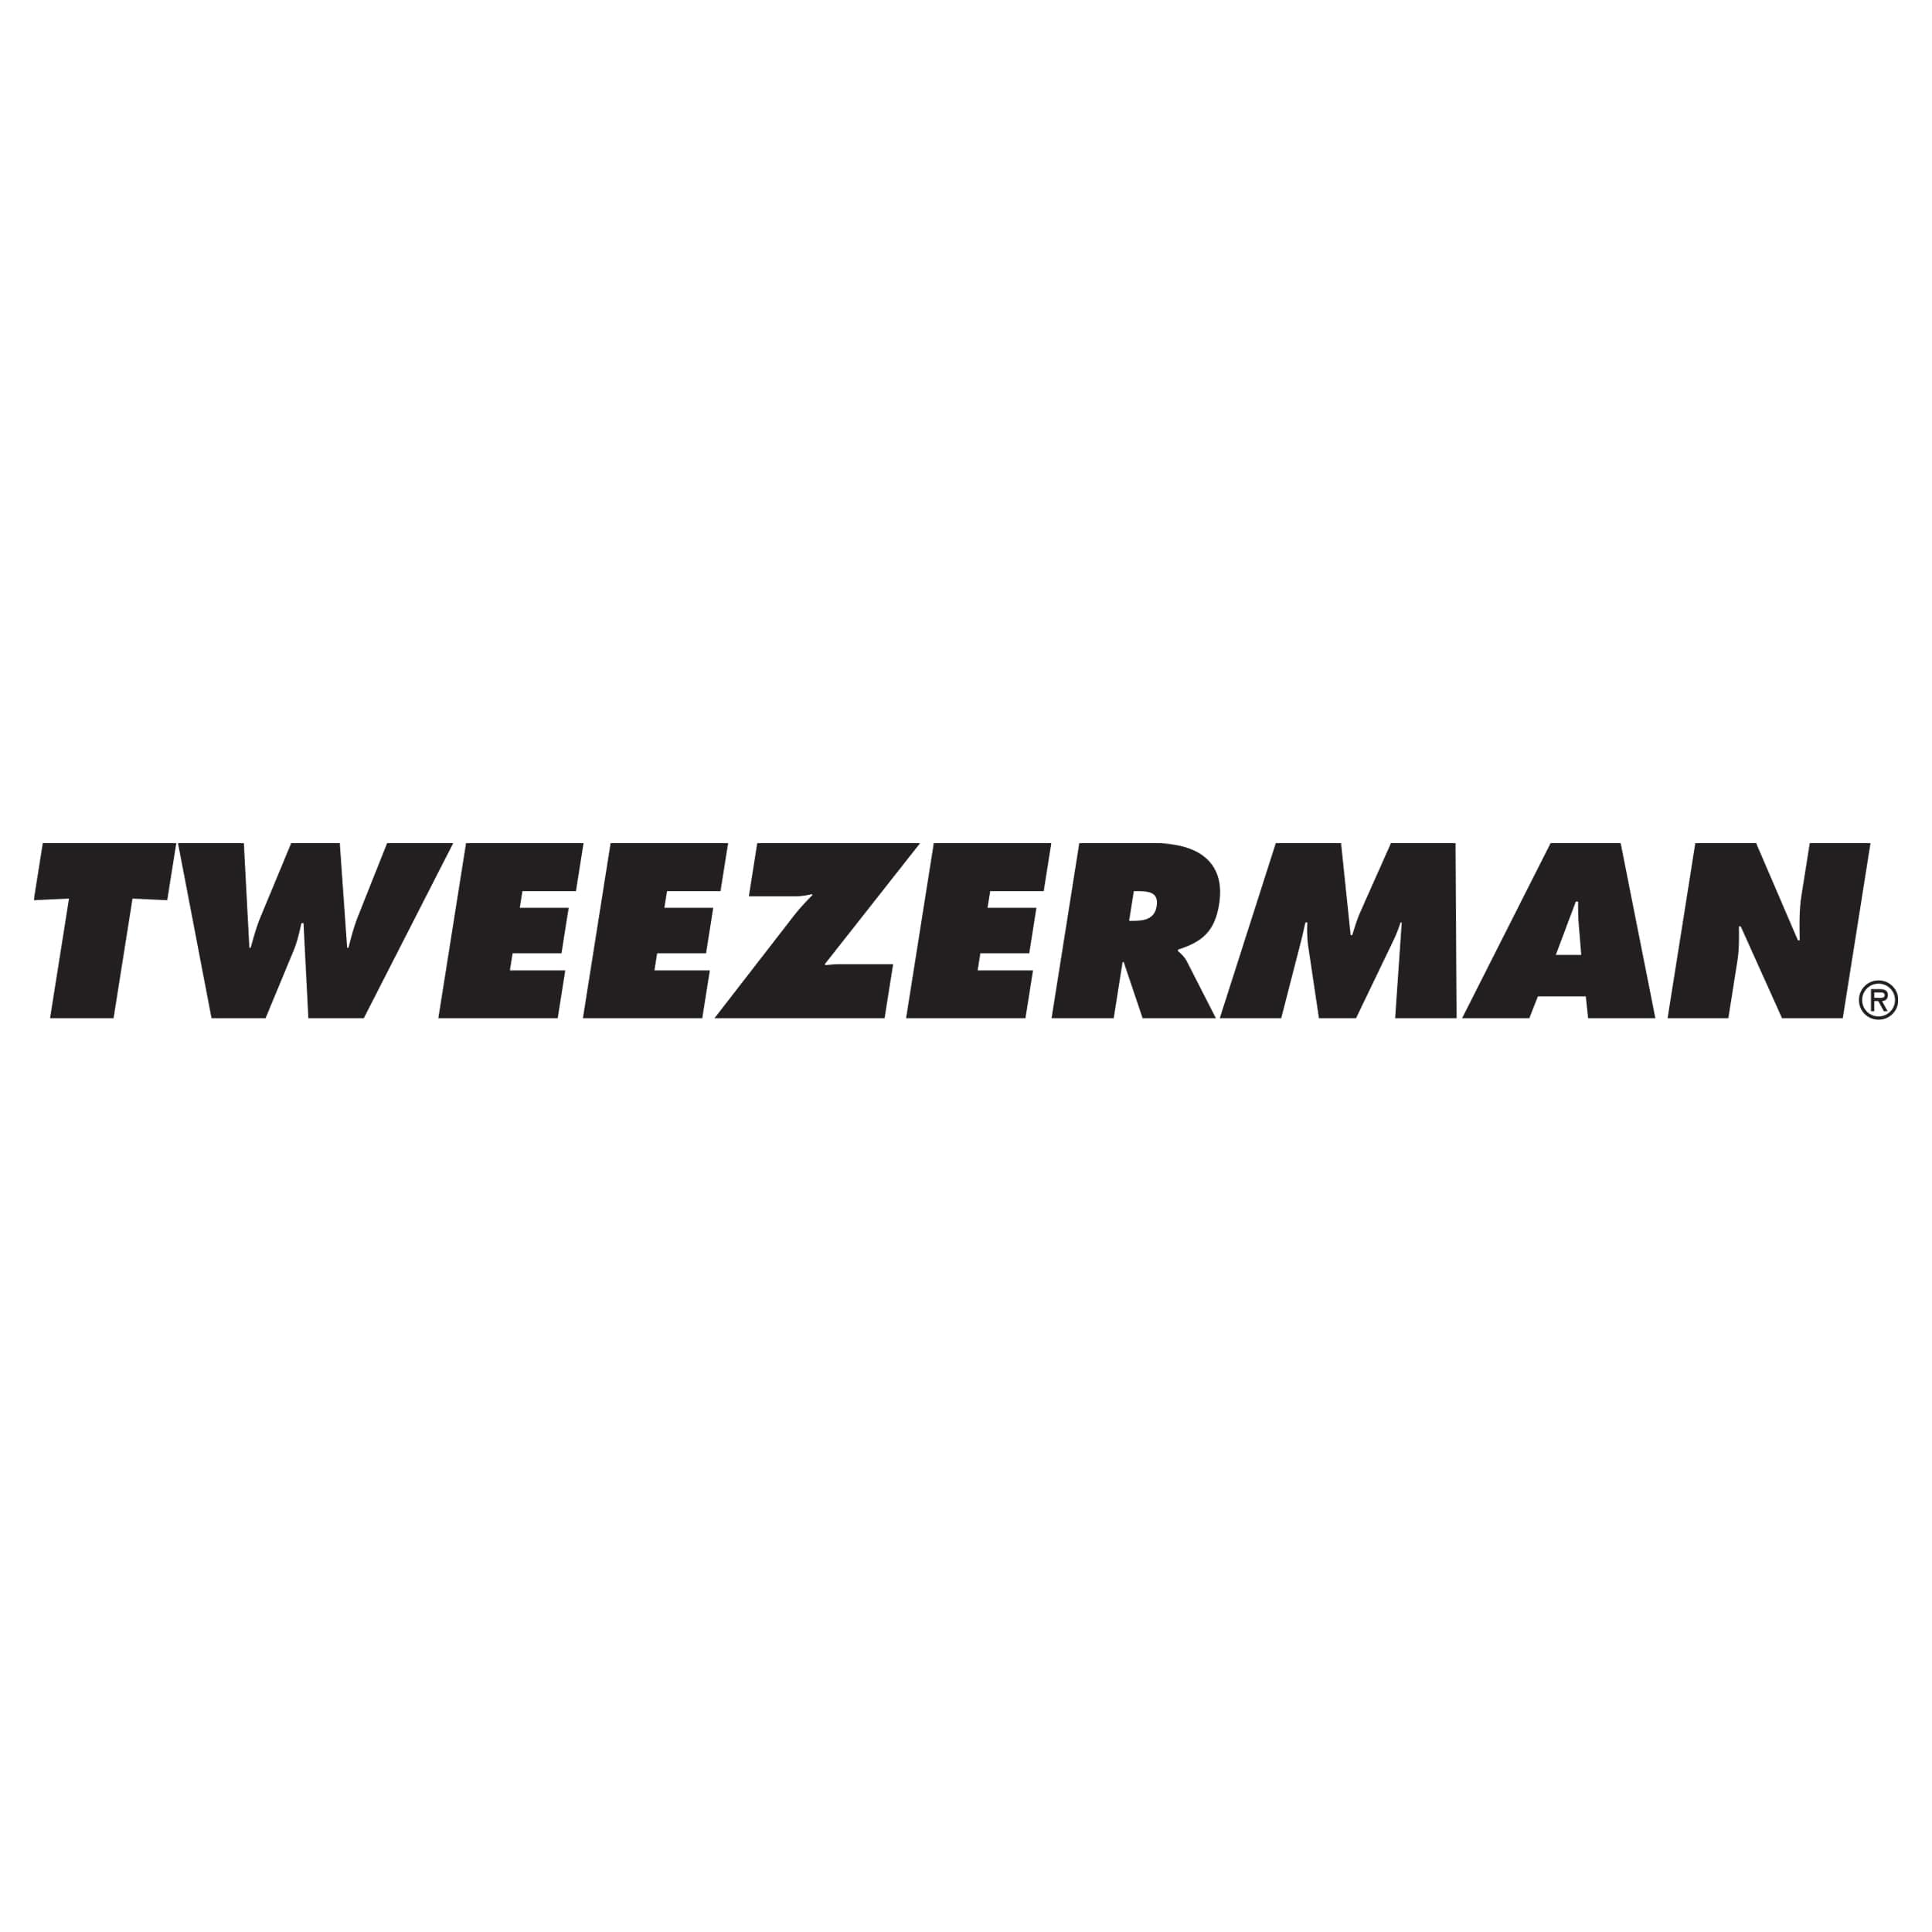 Image of two boxes of Tweezerman Callus Shaver Blades on white background